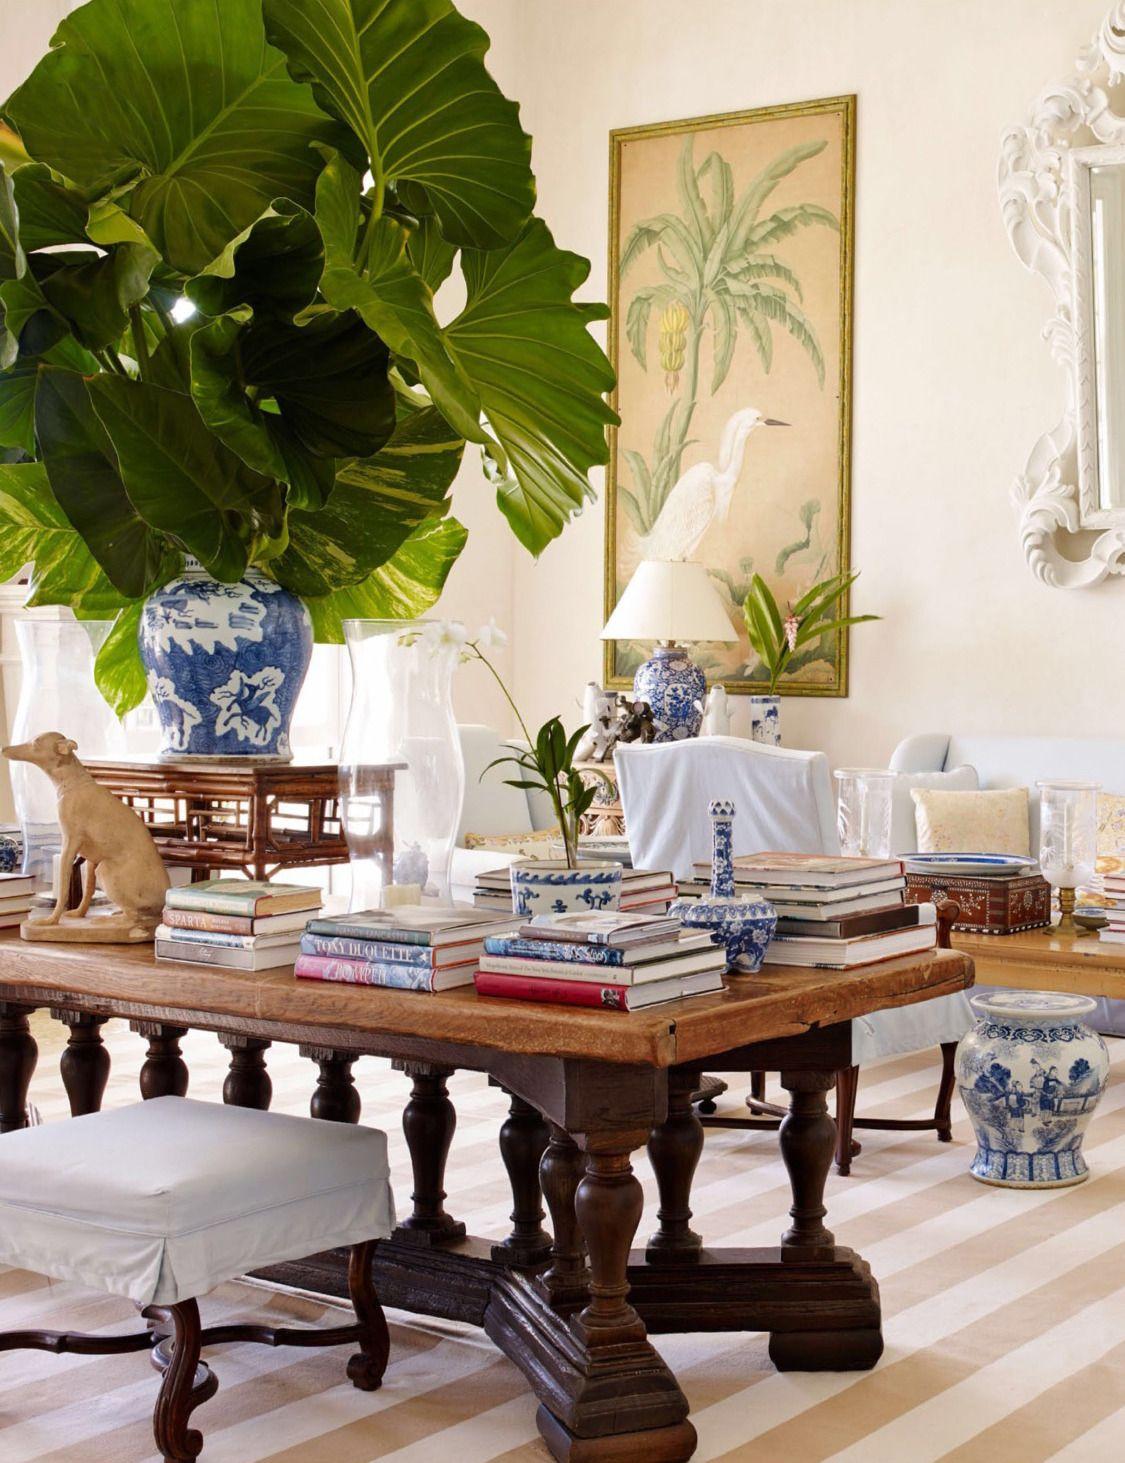 Muebles Punta Cana - Visualjunkee Dominican Dream Photography William Wldron [mjhdah]http://www.homevega.com/images/productos/hogar/11.006.00172/11.006.00172-hogar-muebles-exterior-home-et-sala-jardin-jambeli_2.jpg